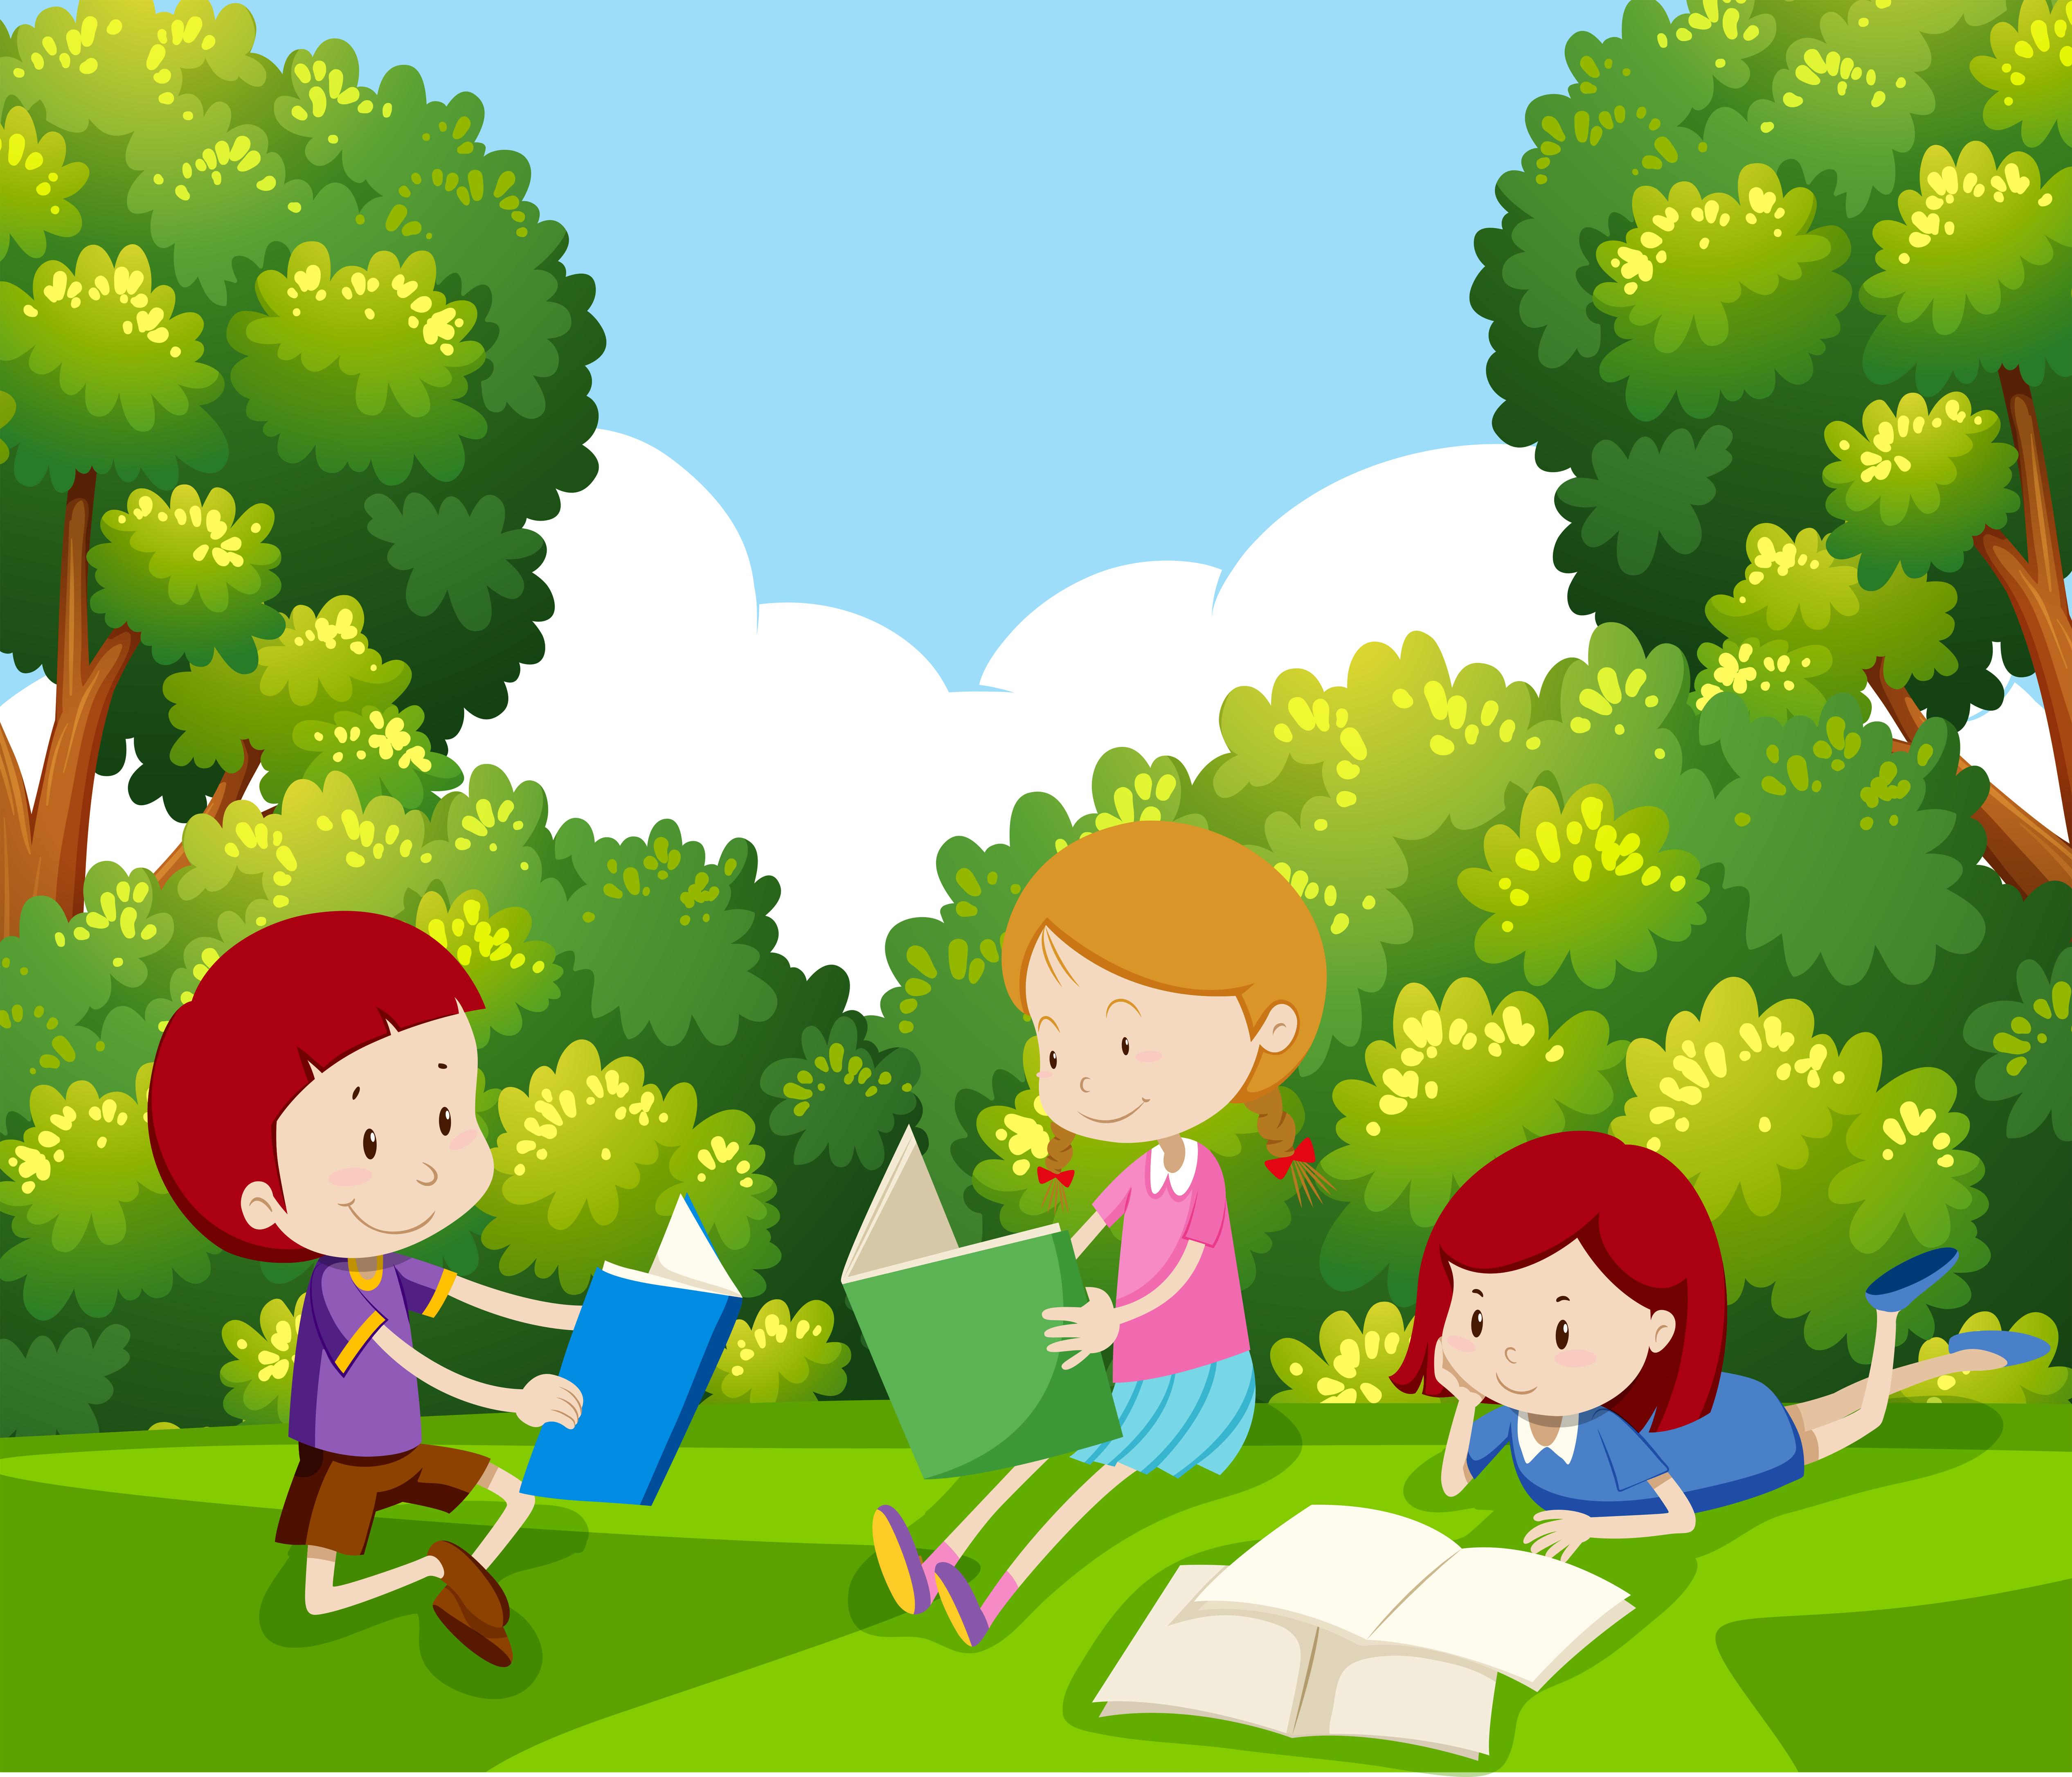 Children Reading A Book Under Tree Download Free Vectors Clipart Graphics Vector Art Winter colorful cartoon christmas tree set vector. vecteezy